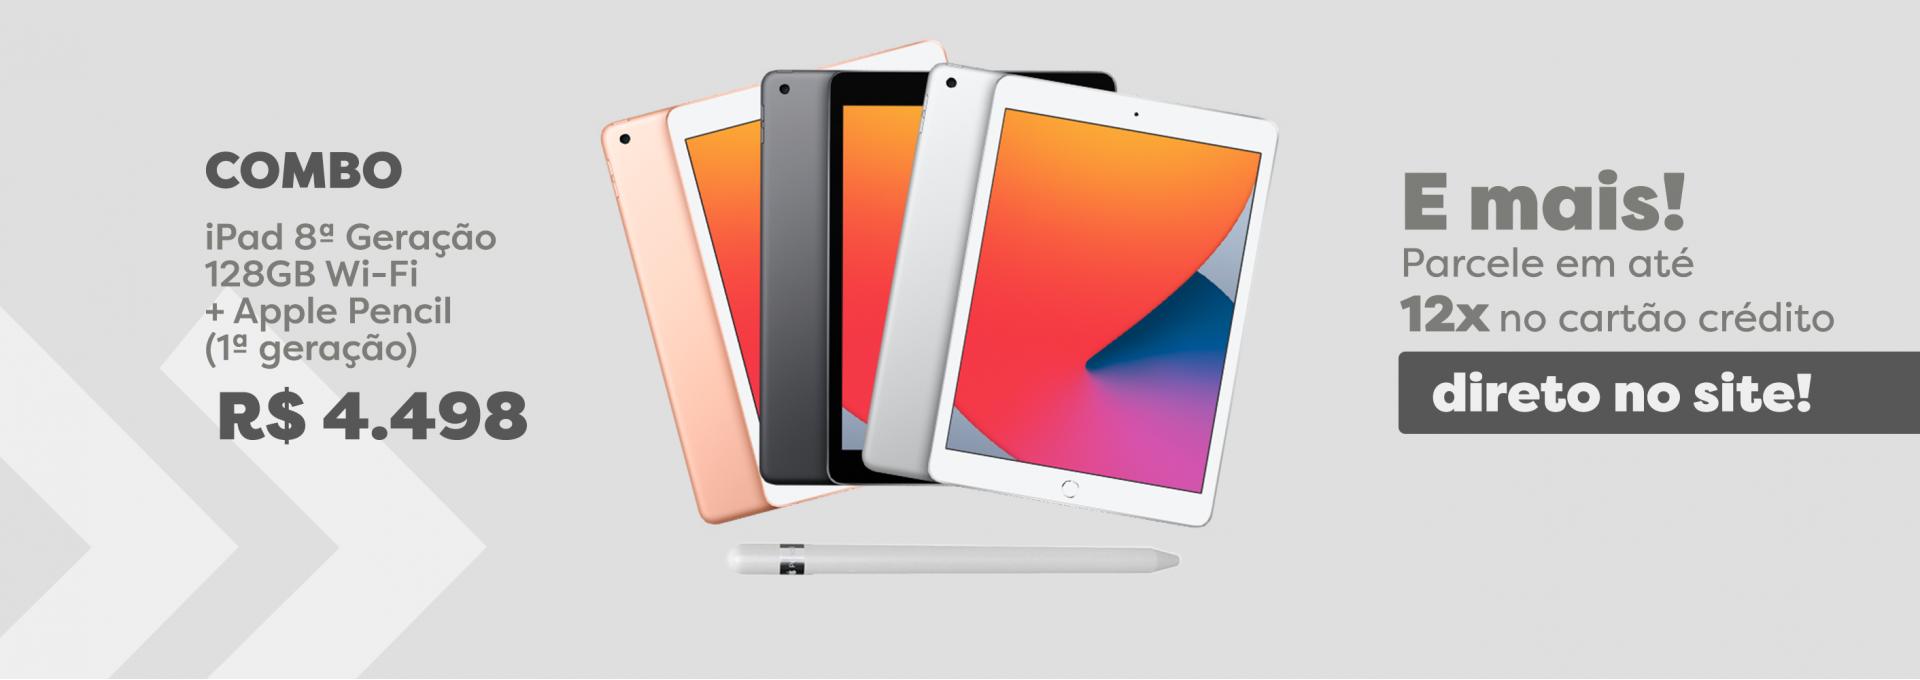 Combo iPad 8ª Geração Go Imports